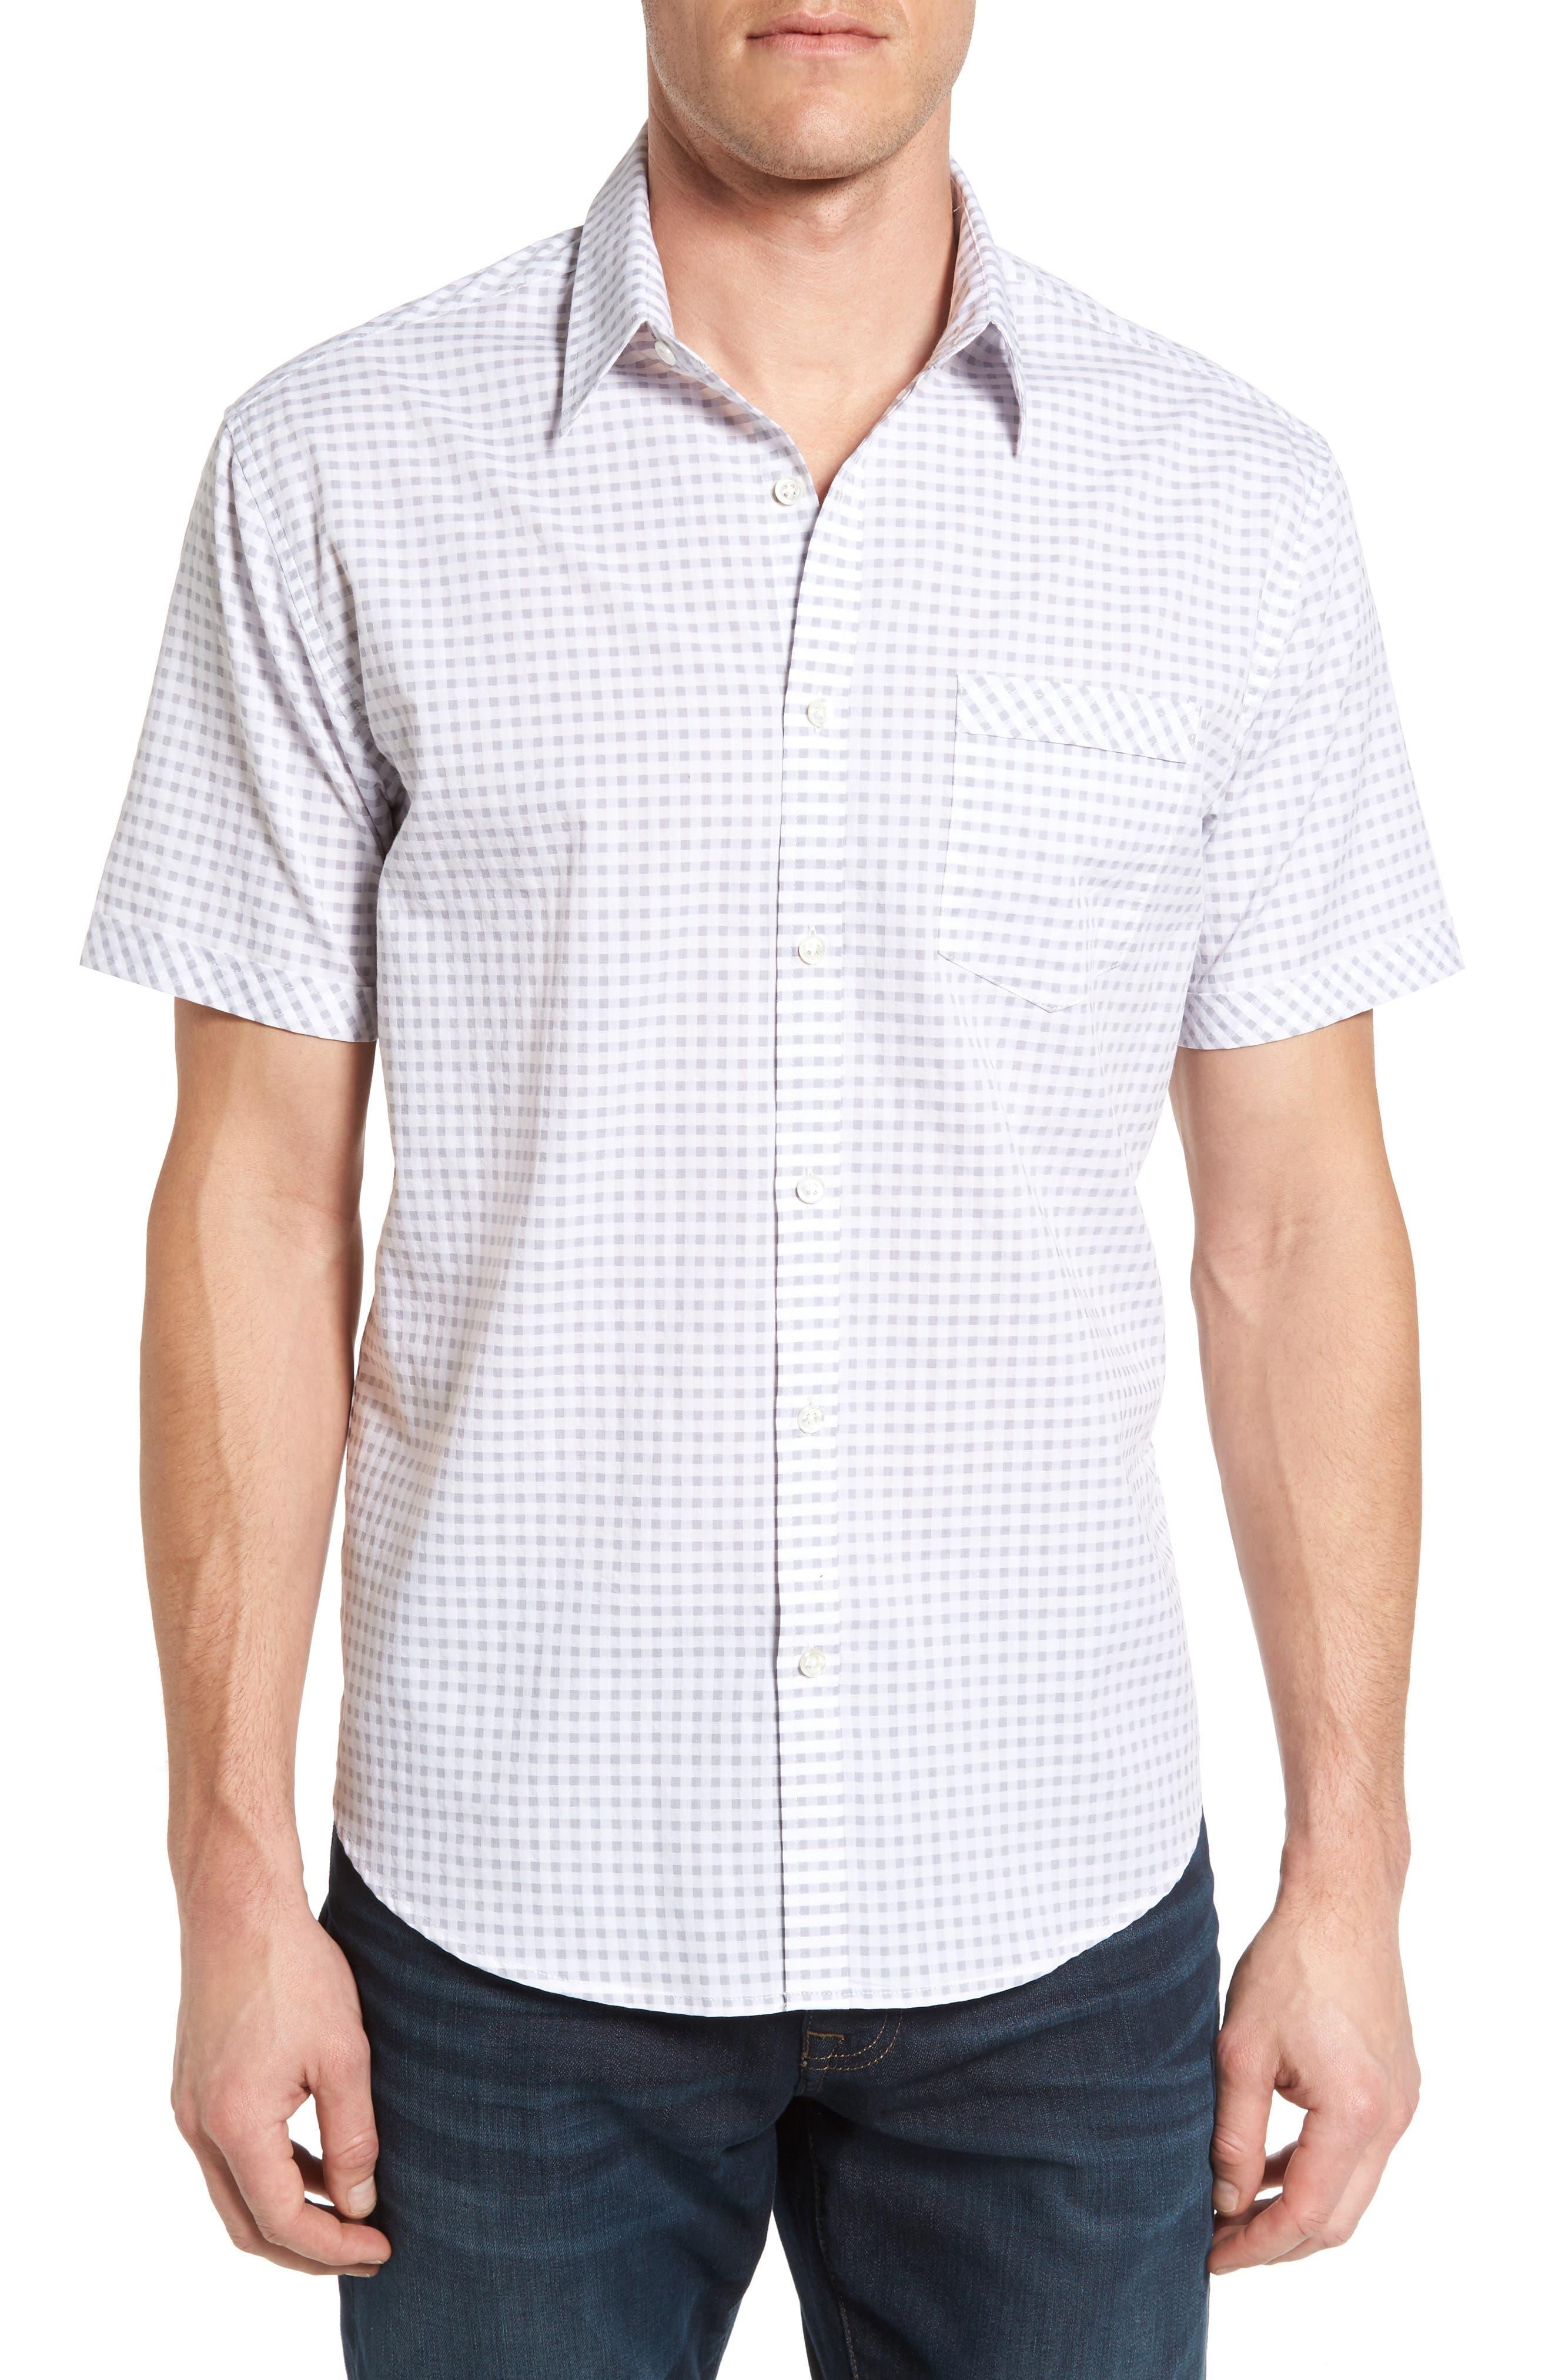 James Campbell Colina Regular Fit Short Sleeve Sport Shirt